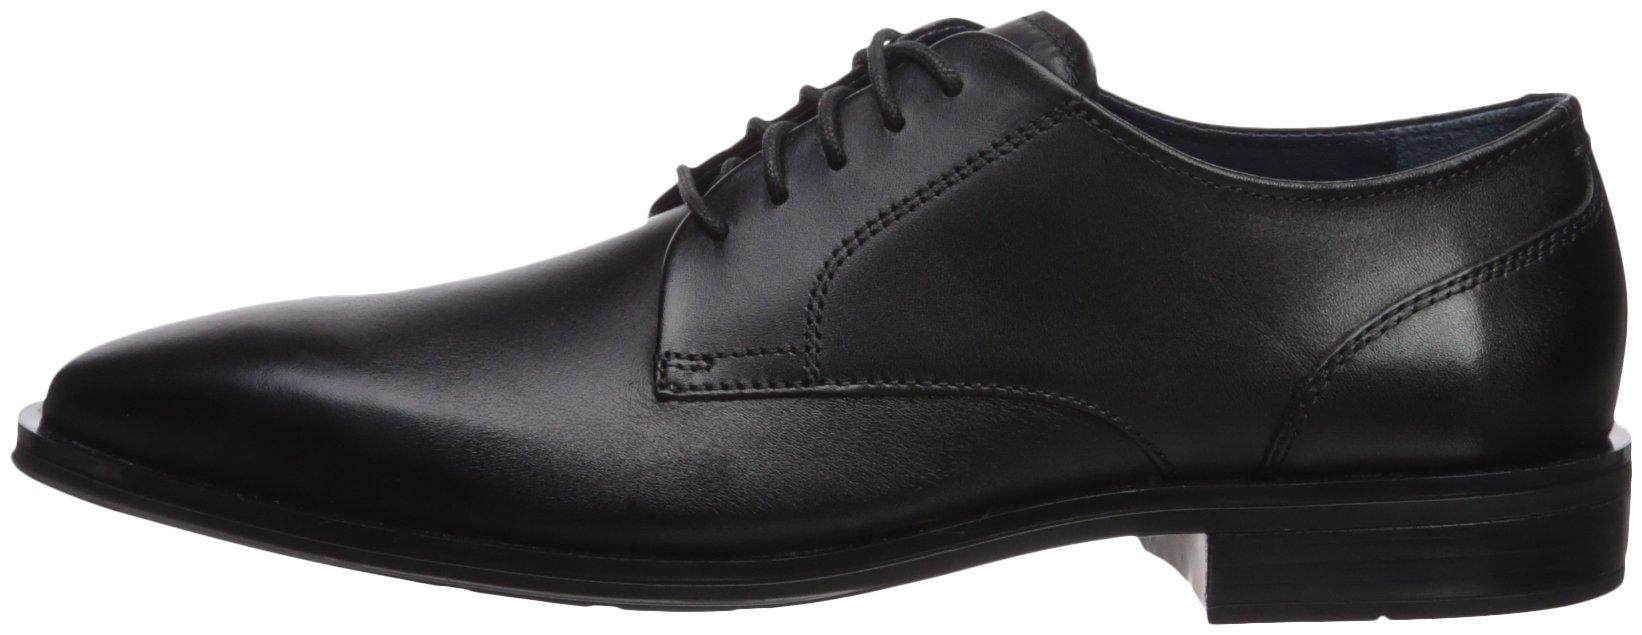 Cole Haan Men's Dawes Grand Plain Toe Oxford, Black, 11 Medium US by Cole Haan (Image #5)